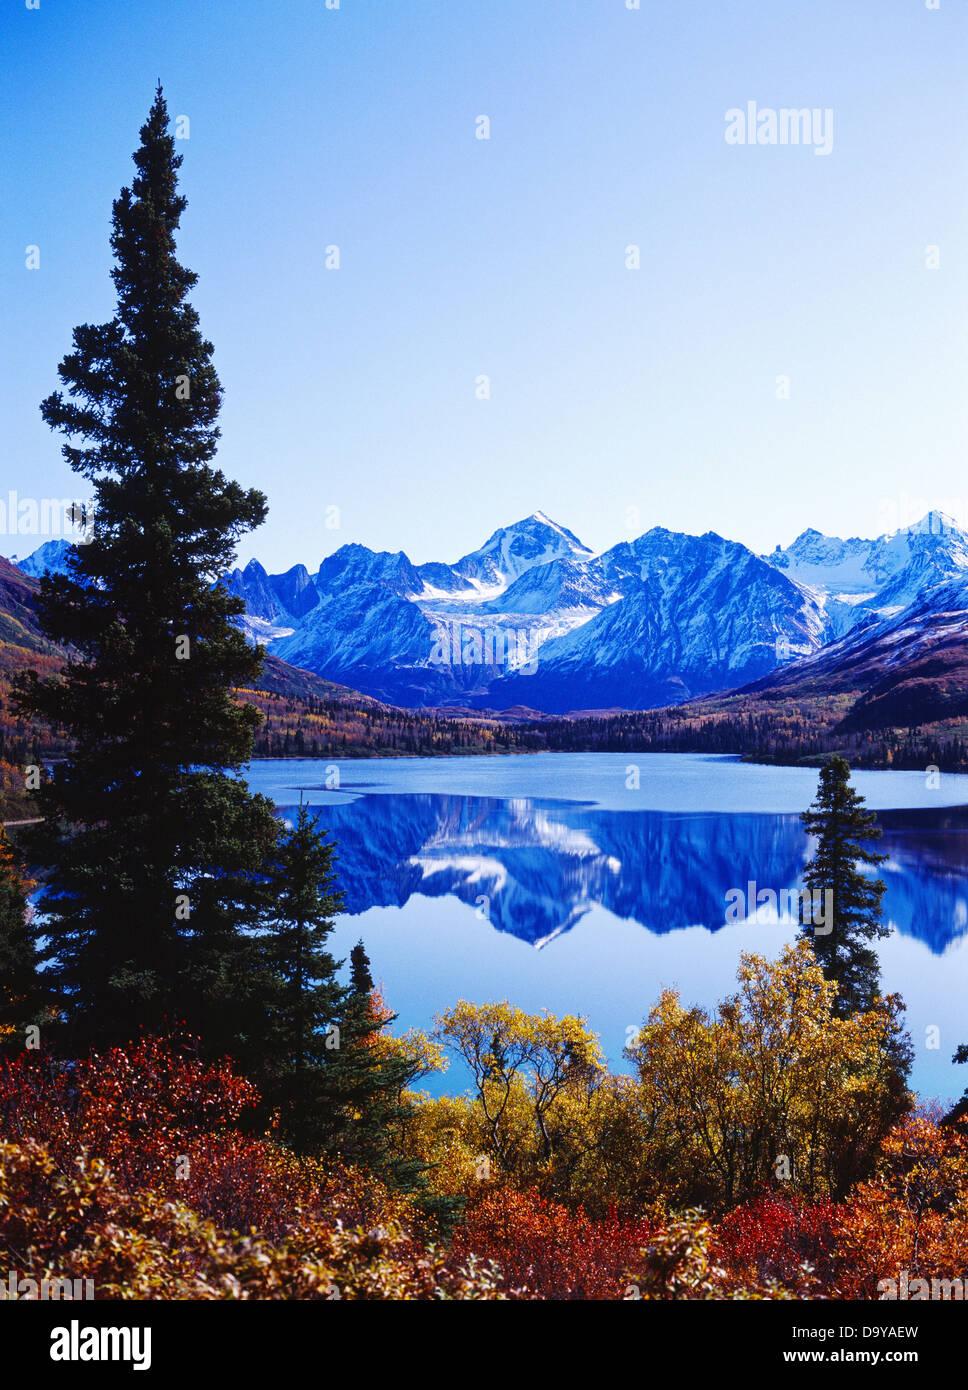 USA, Alaska, Lake Clark National Park, Chigmit Mountains reflected in Portage Lake - Stock Image